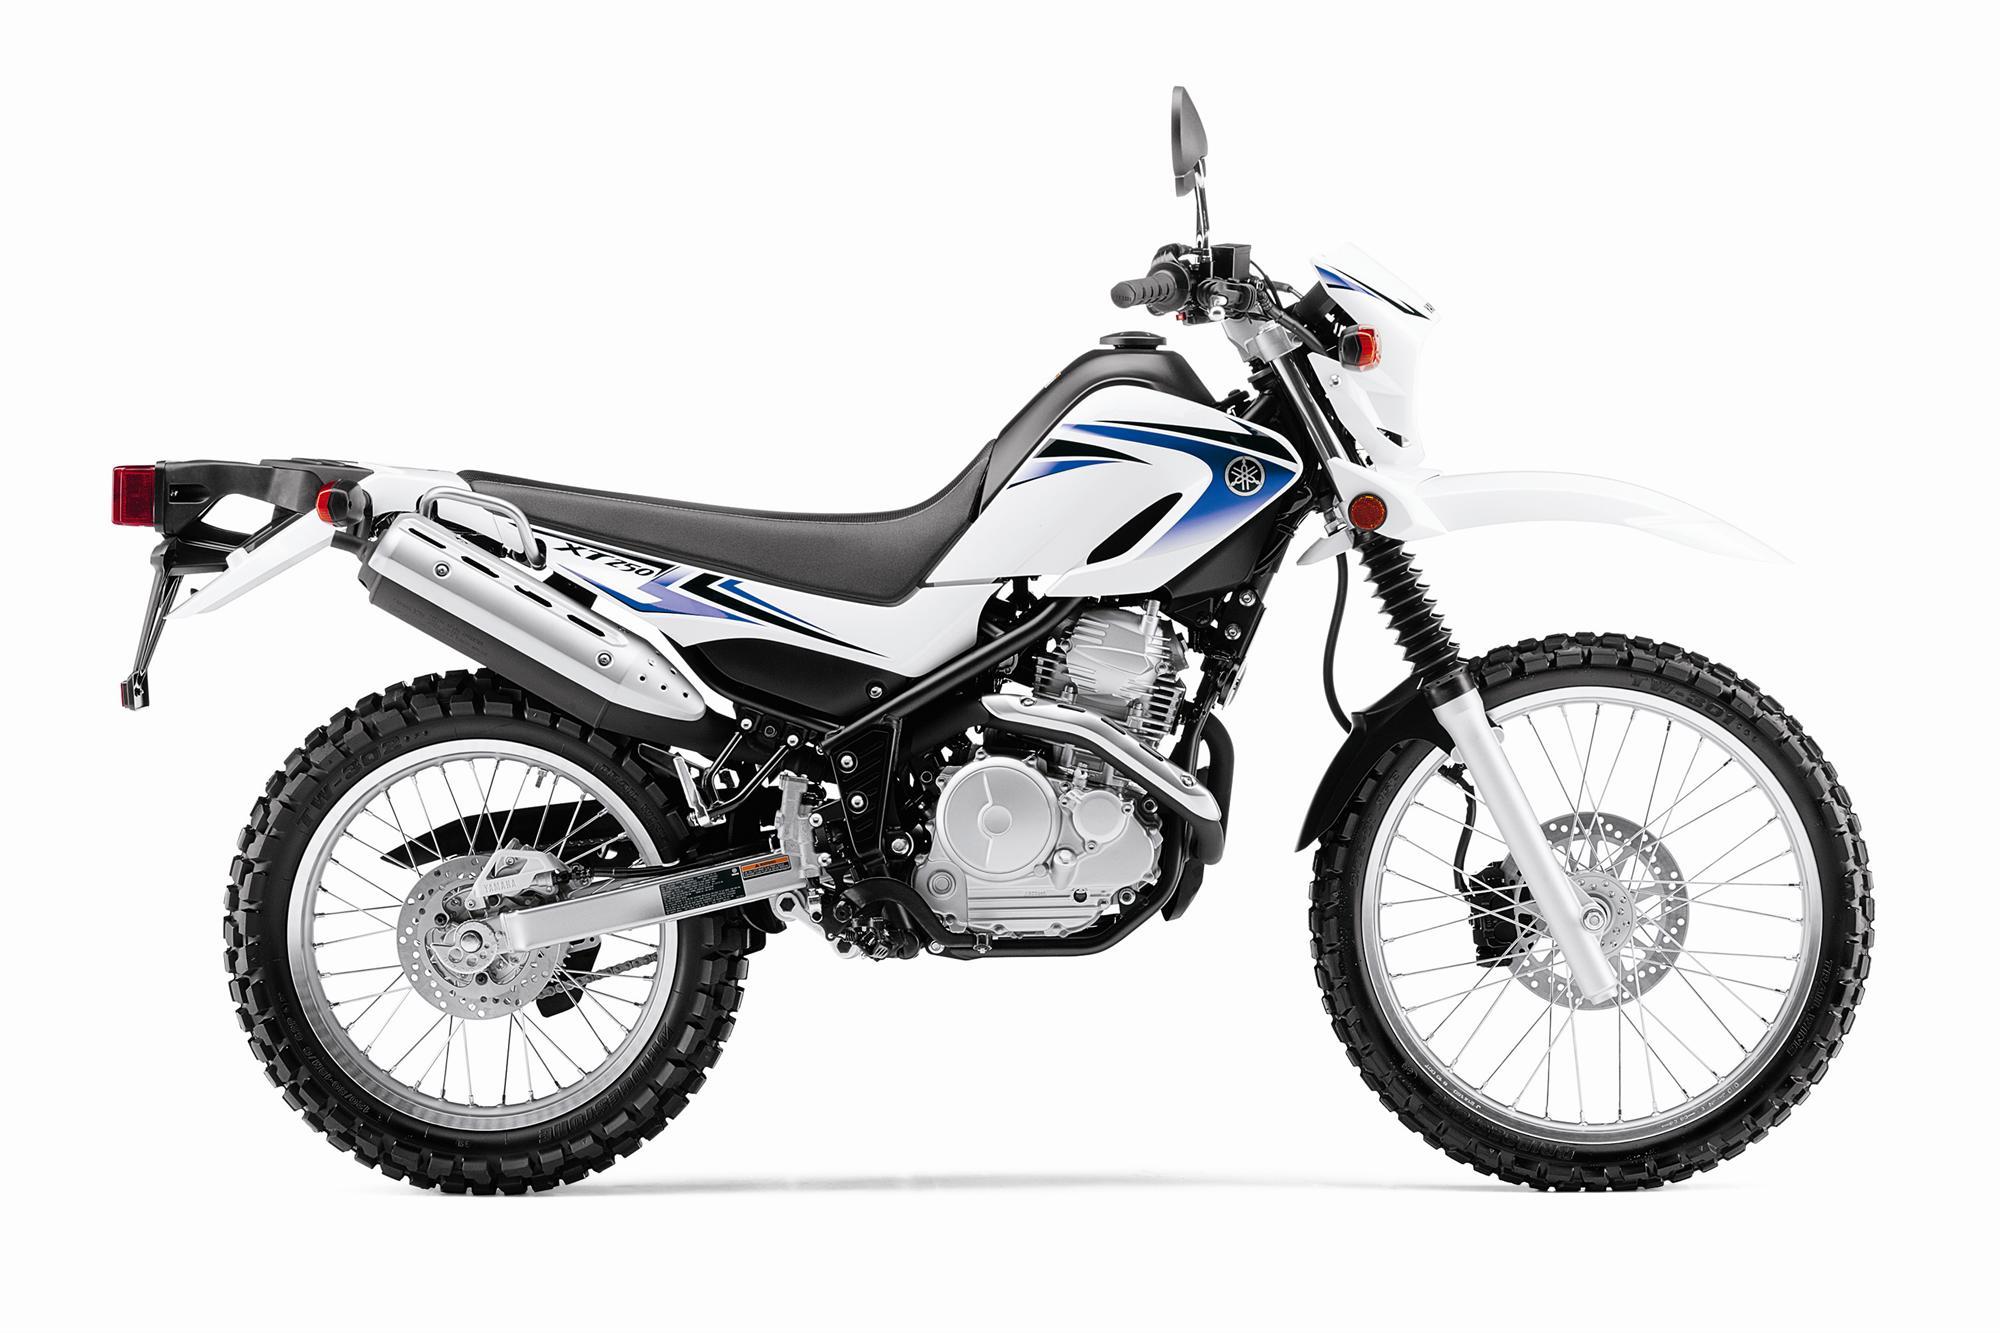 Yamaha xt250 specs 2011 2012 autoevolution for Yamaha xt250 specs